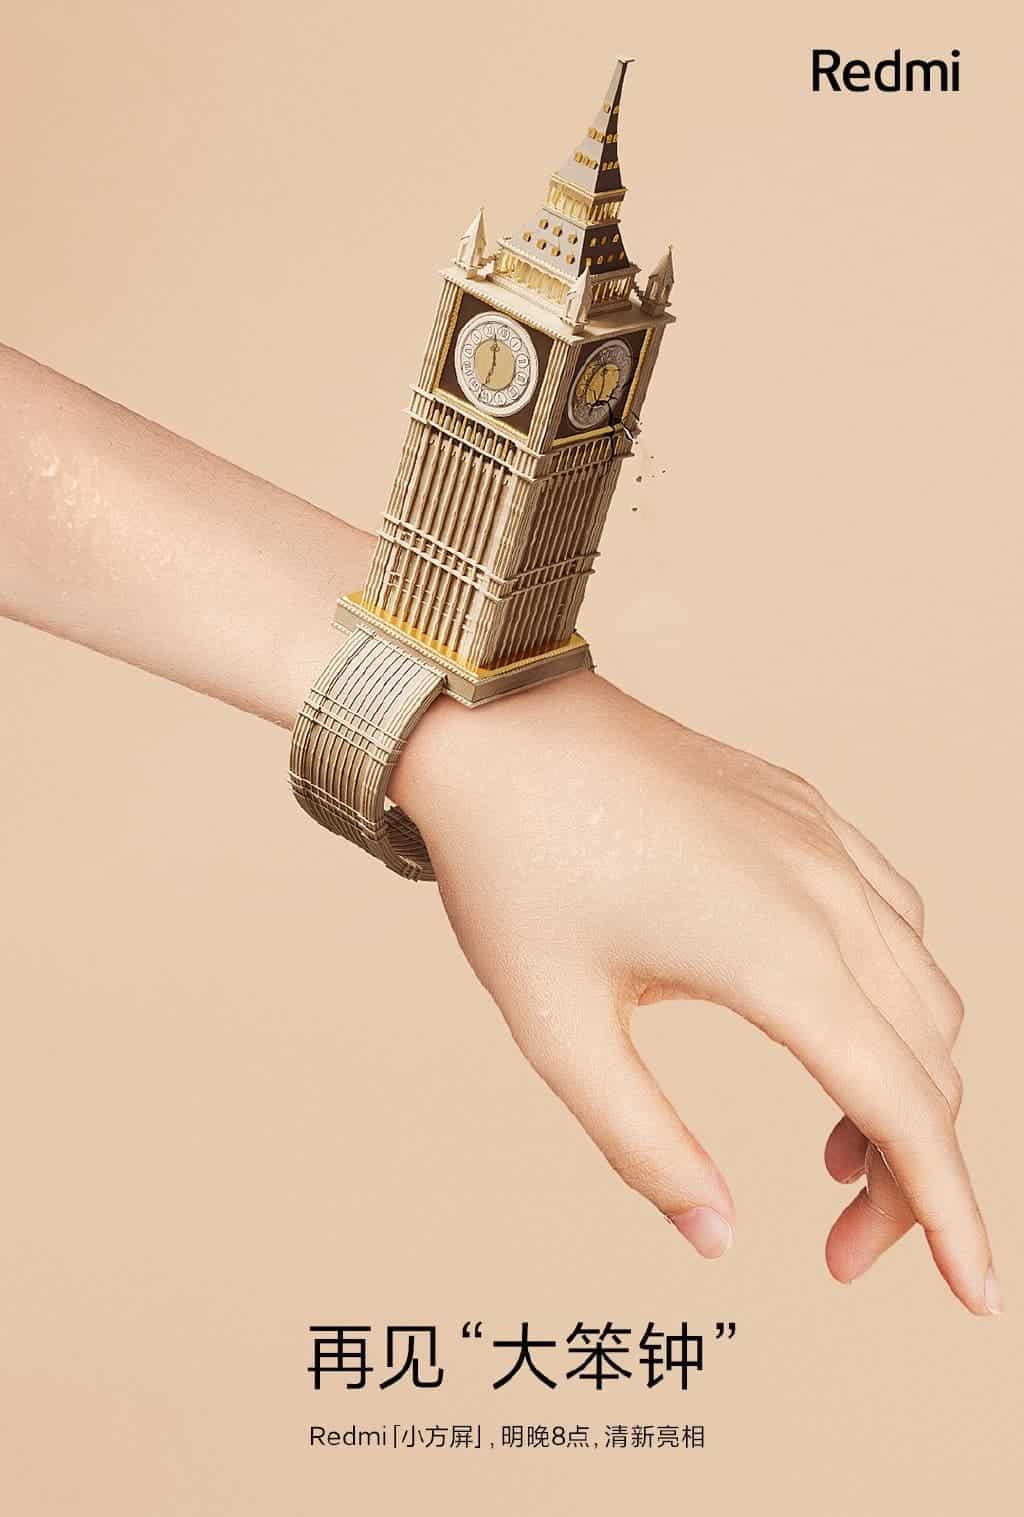 Redmi Smartwatch